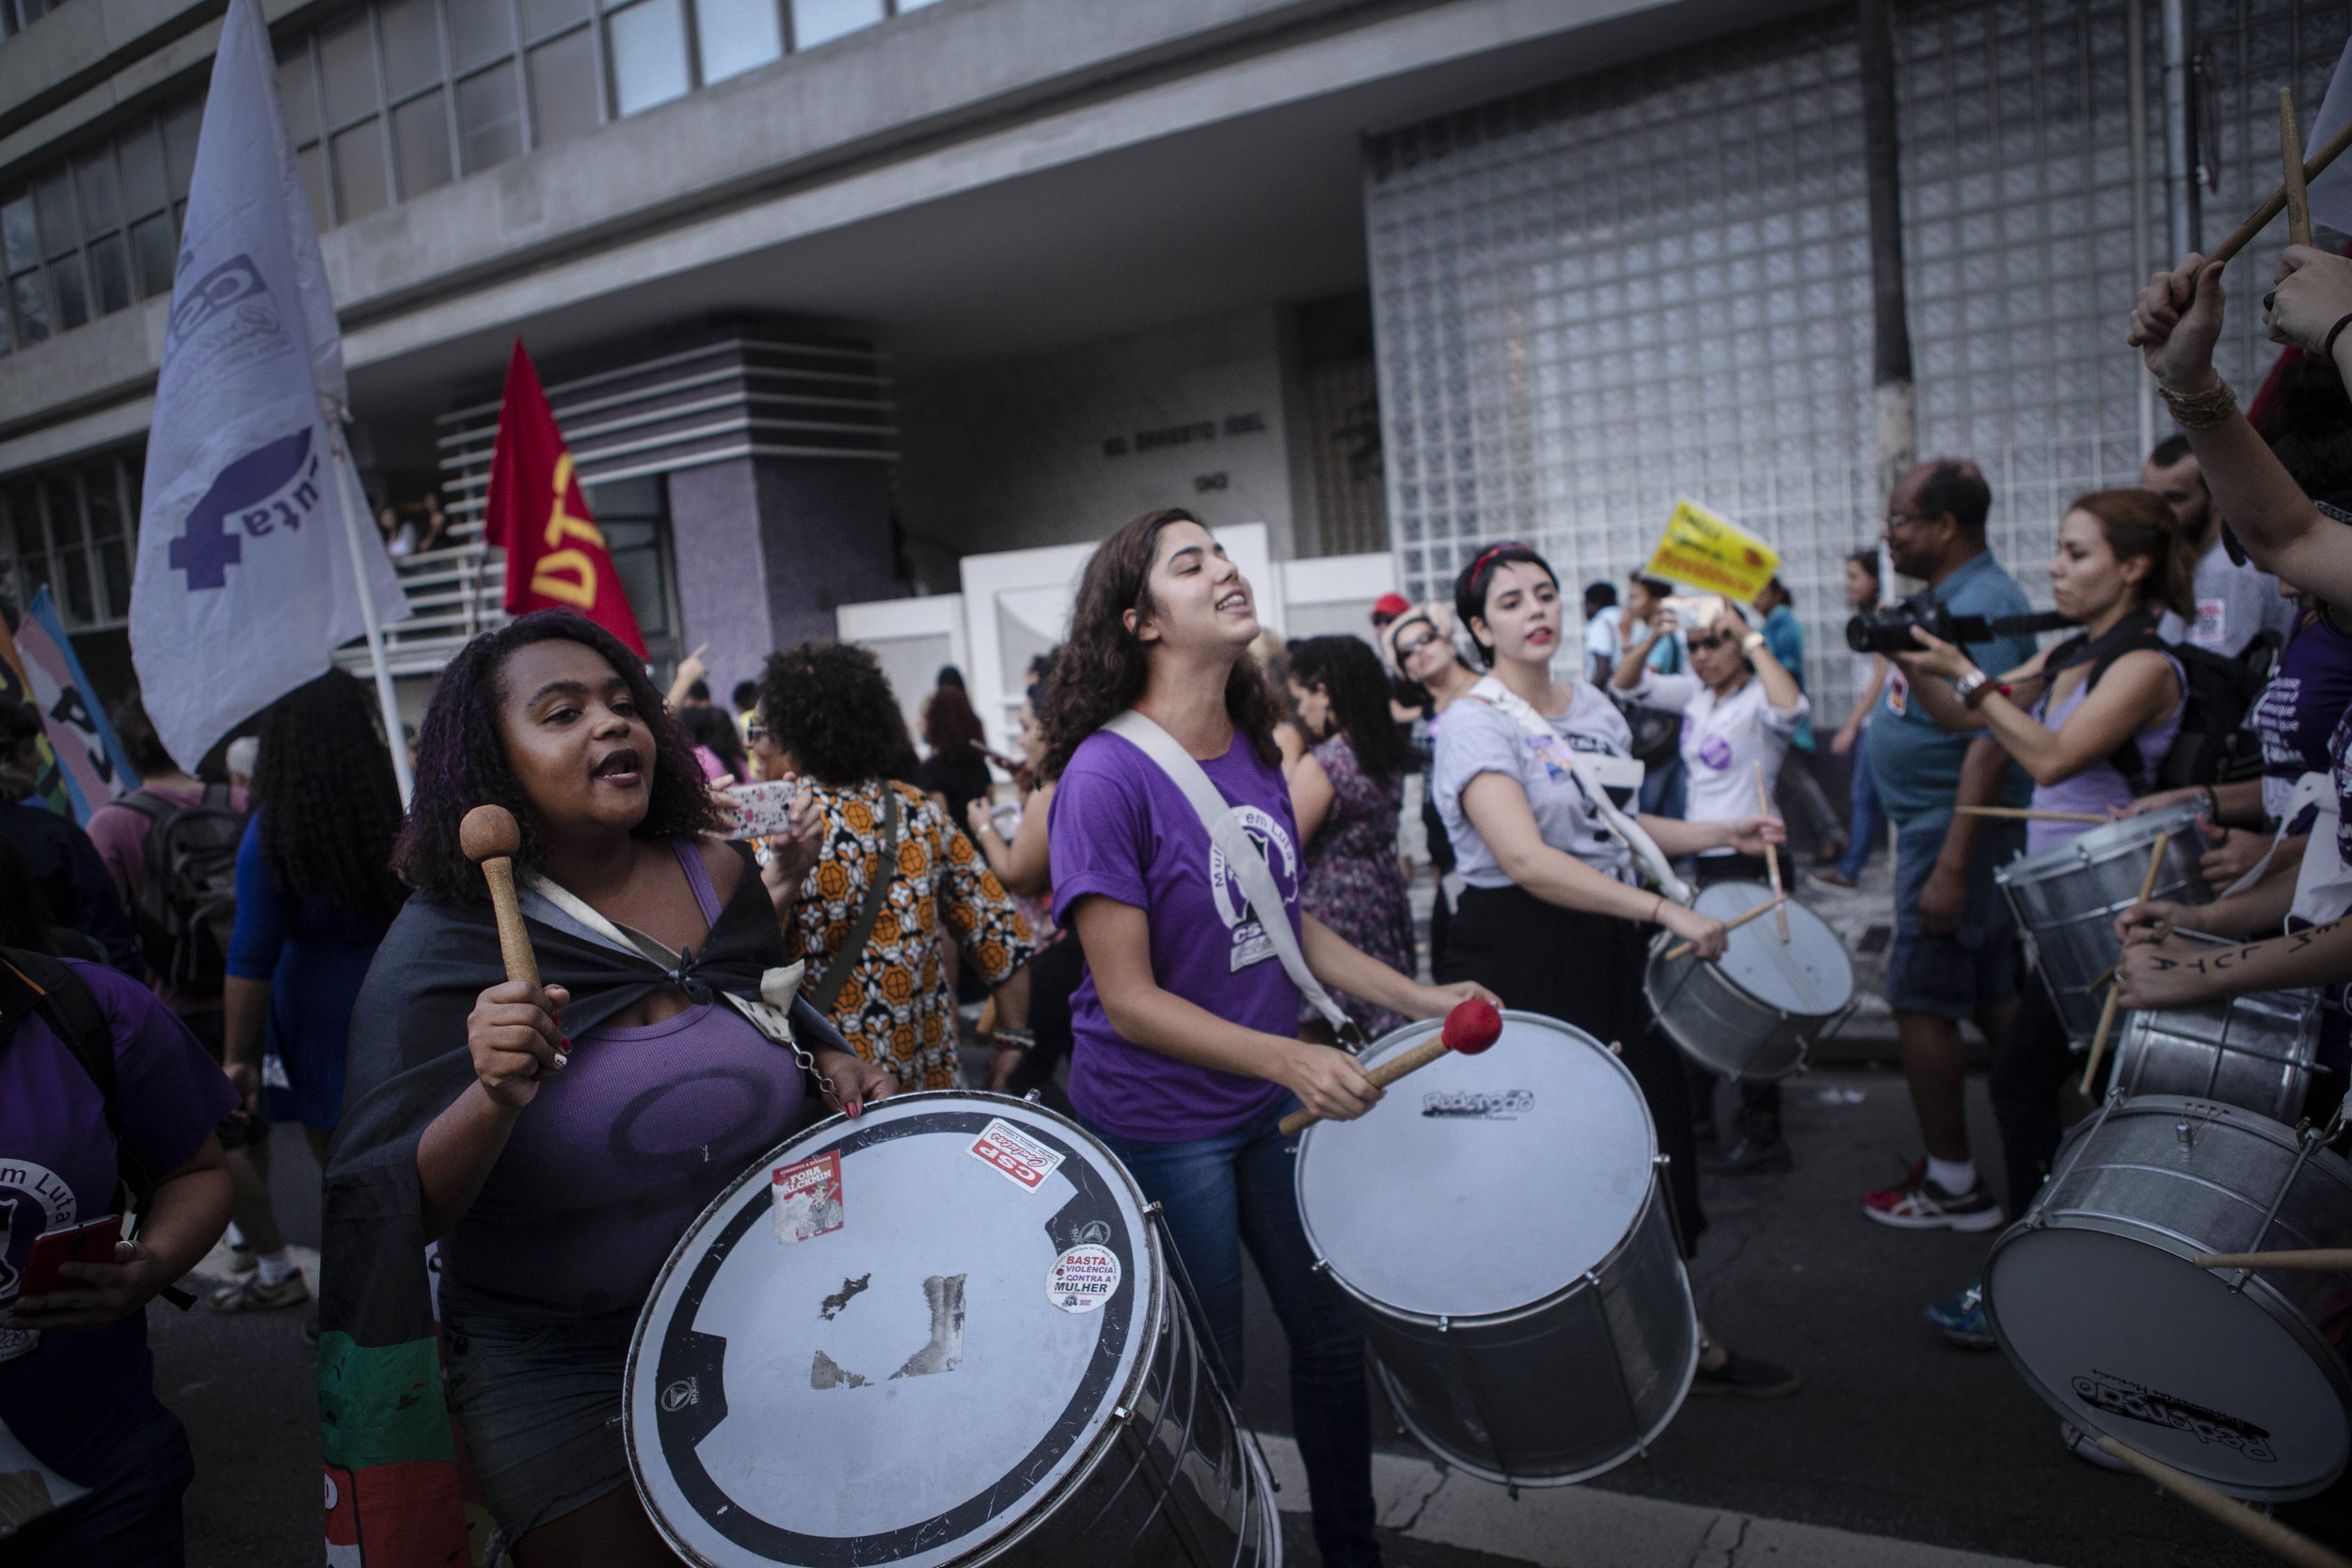 Foto: Pétala Lopes, Coletivo Amapoa